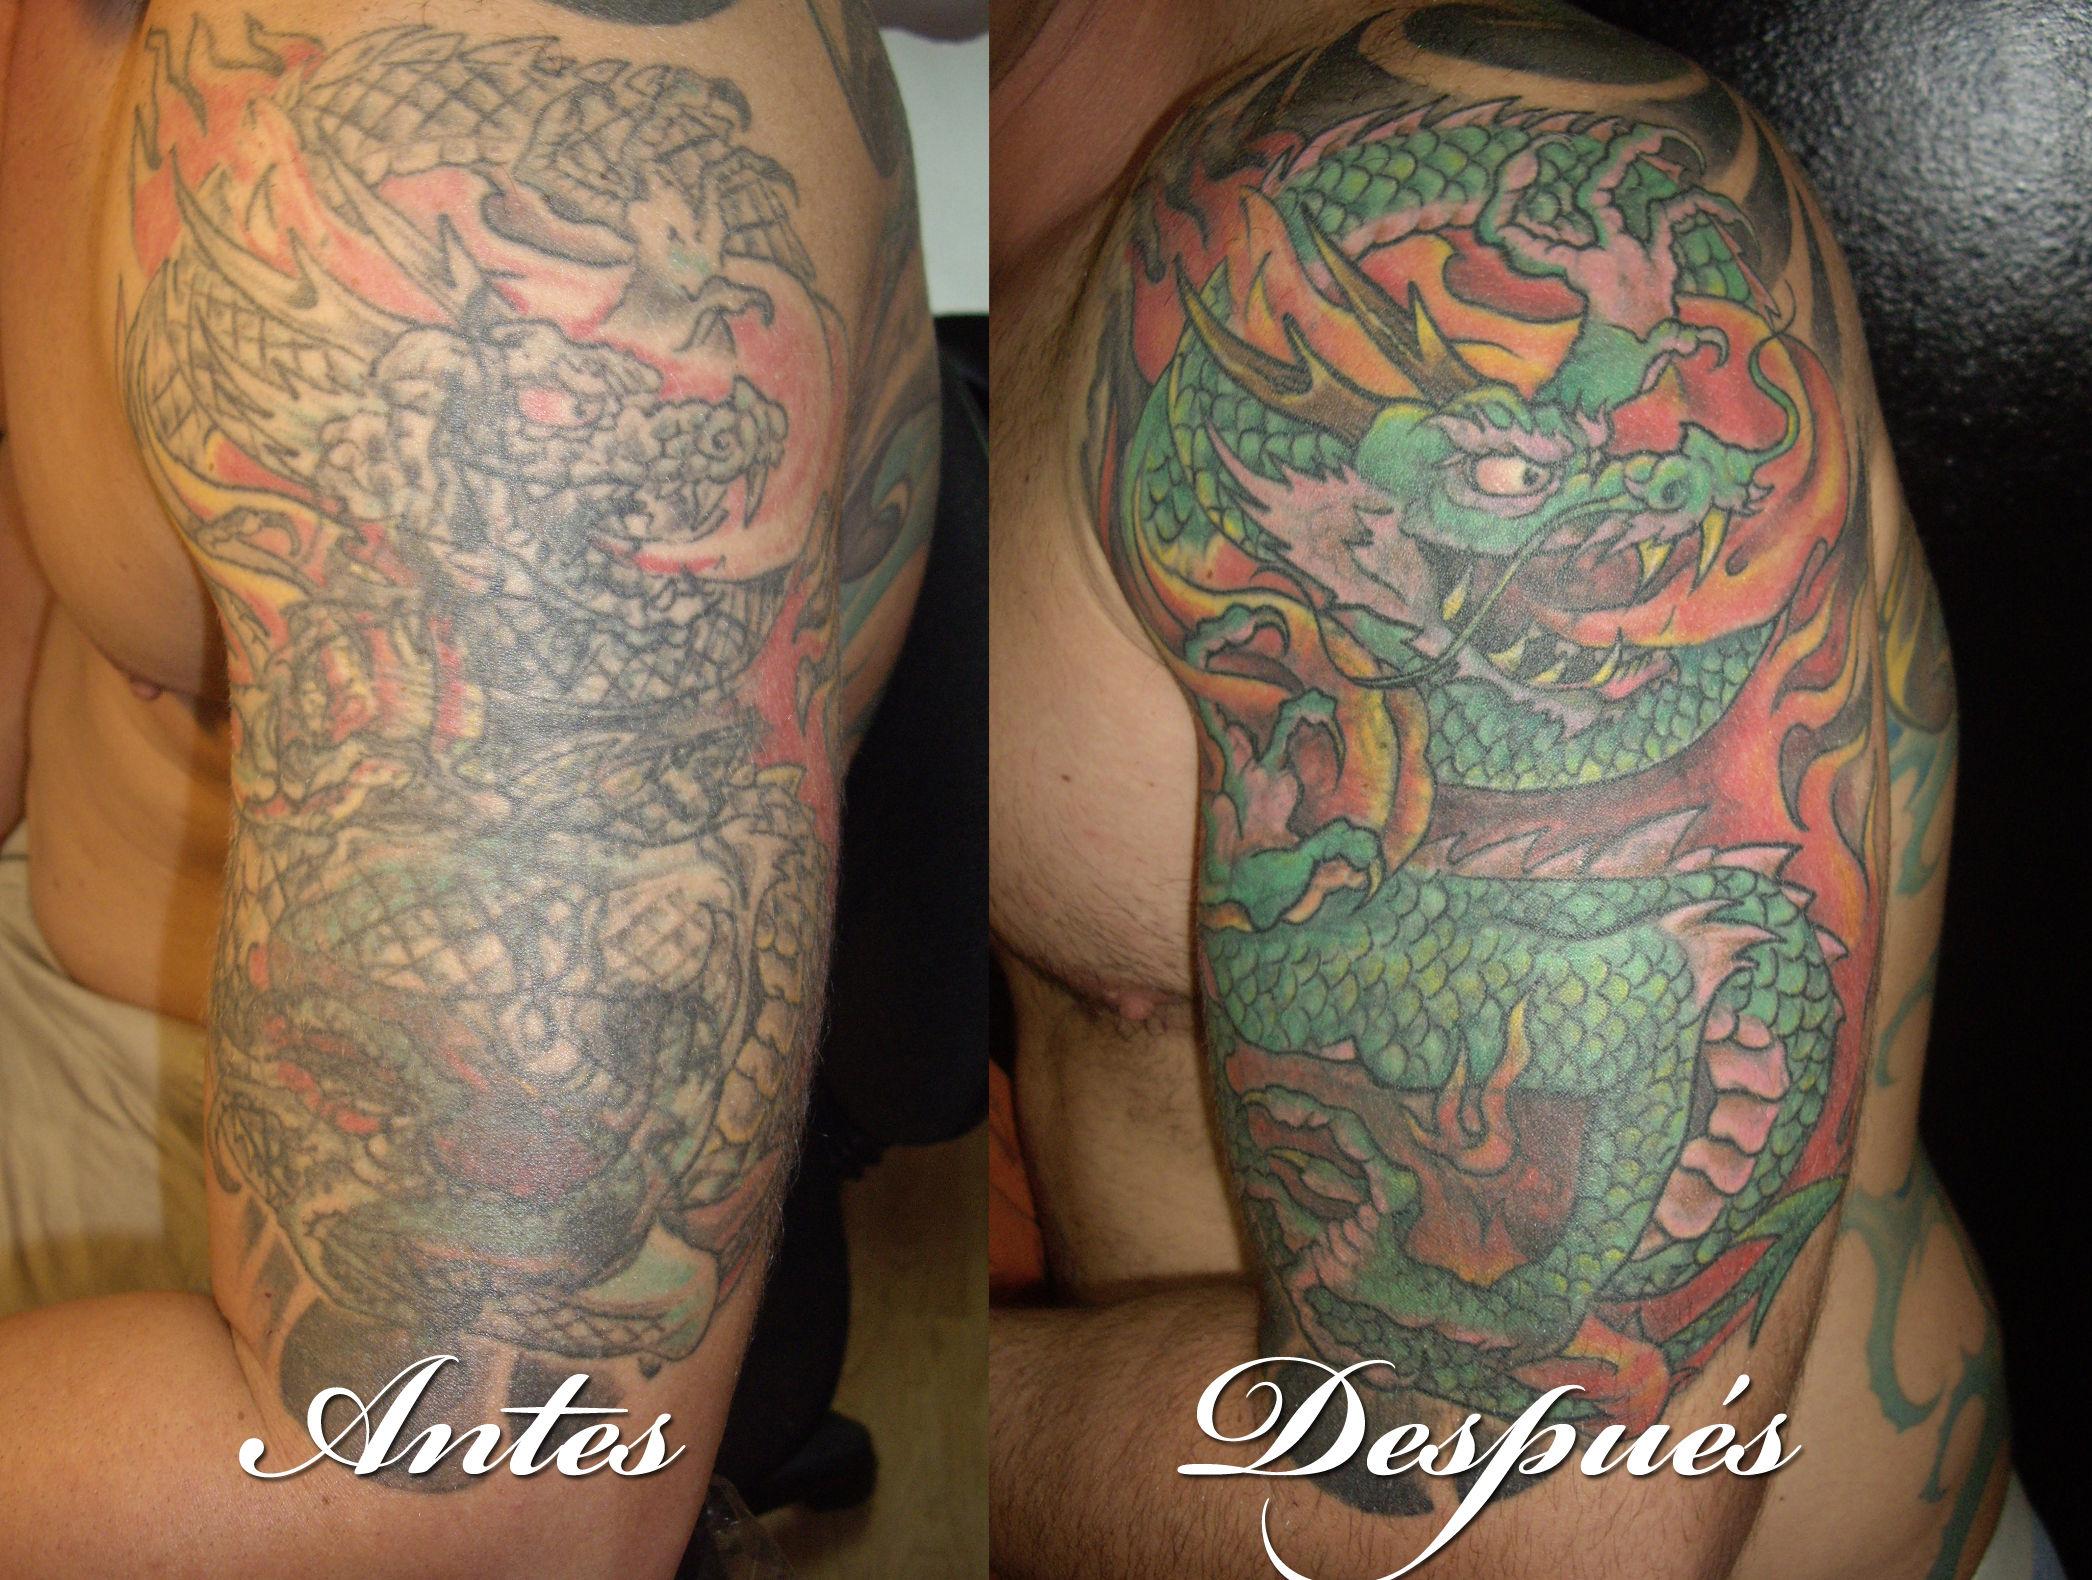 Foto 7 de Tatuajes en Las Palmas de Gran Canaria | La Madre Tattoo & Piercing